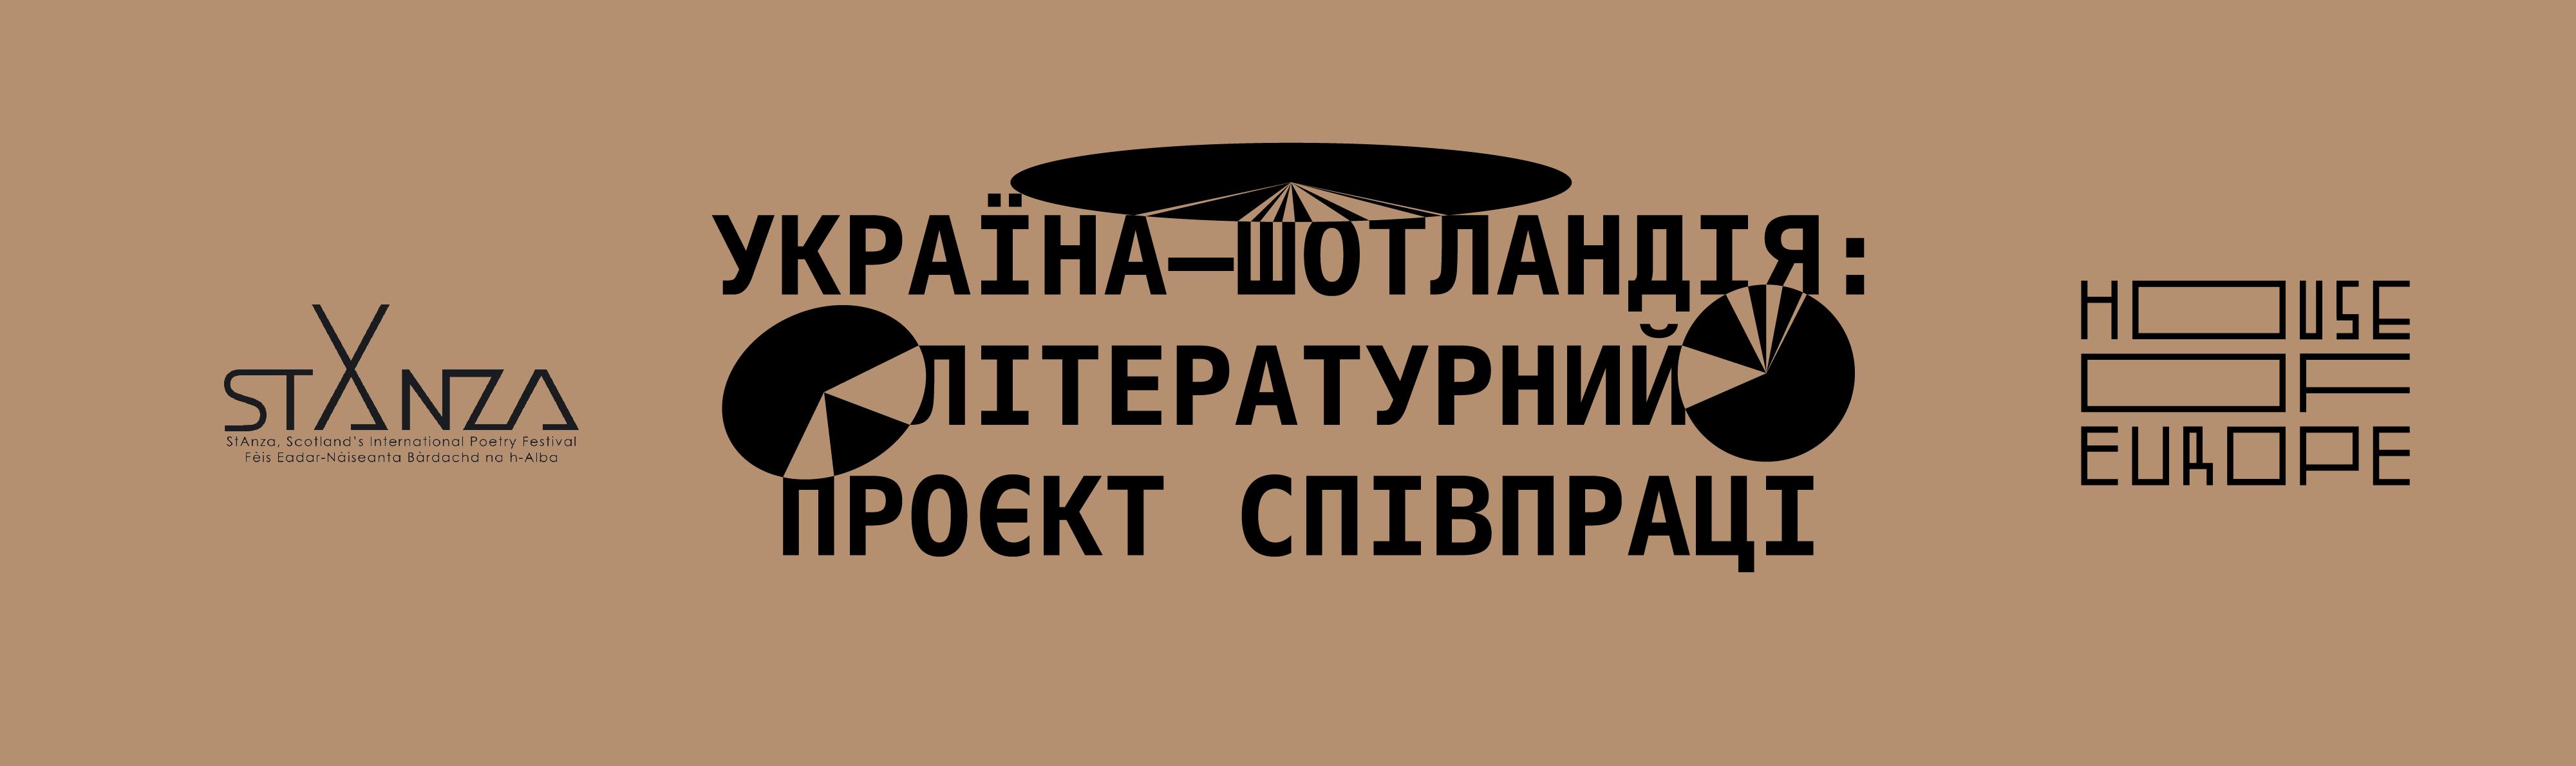 Image to Ukraine-Scotland: Literary Cooperation Project